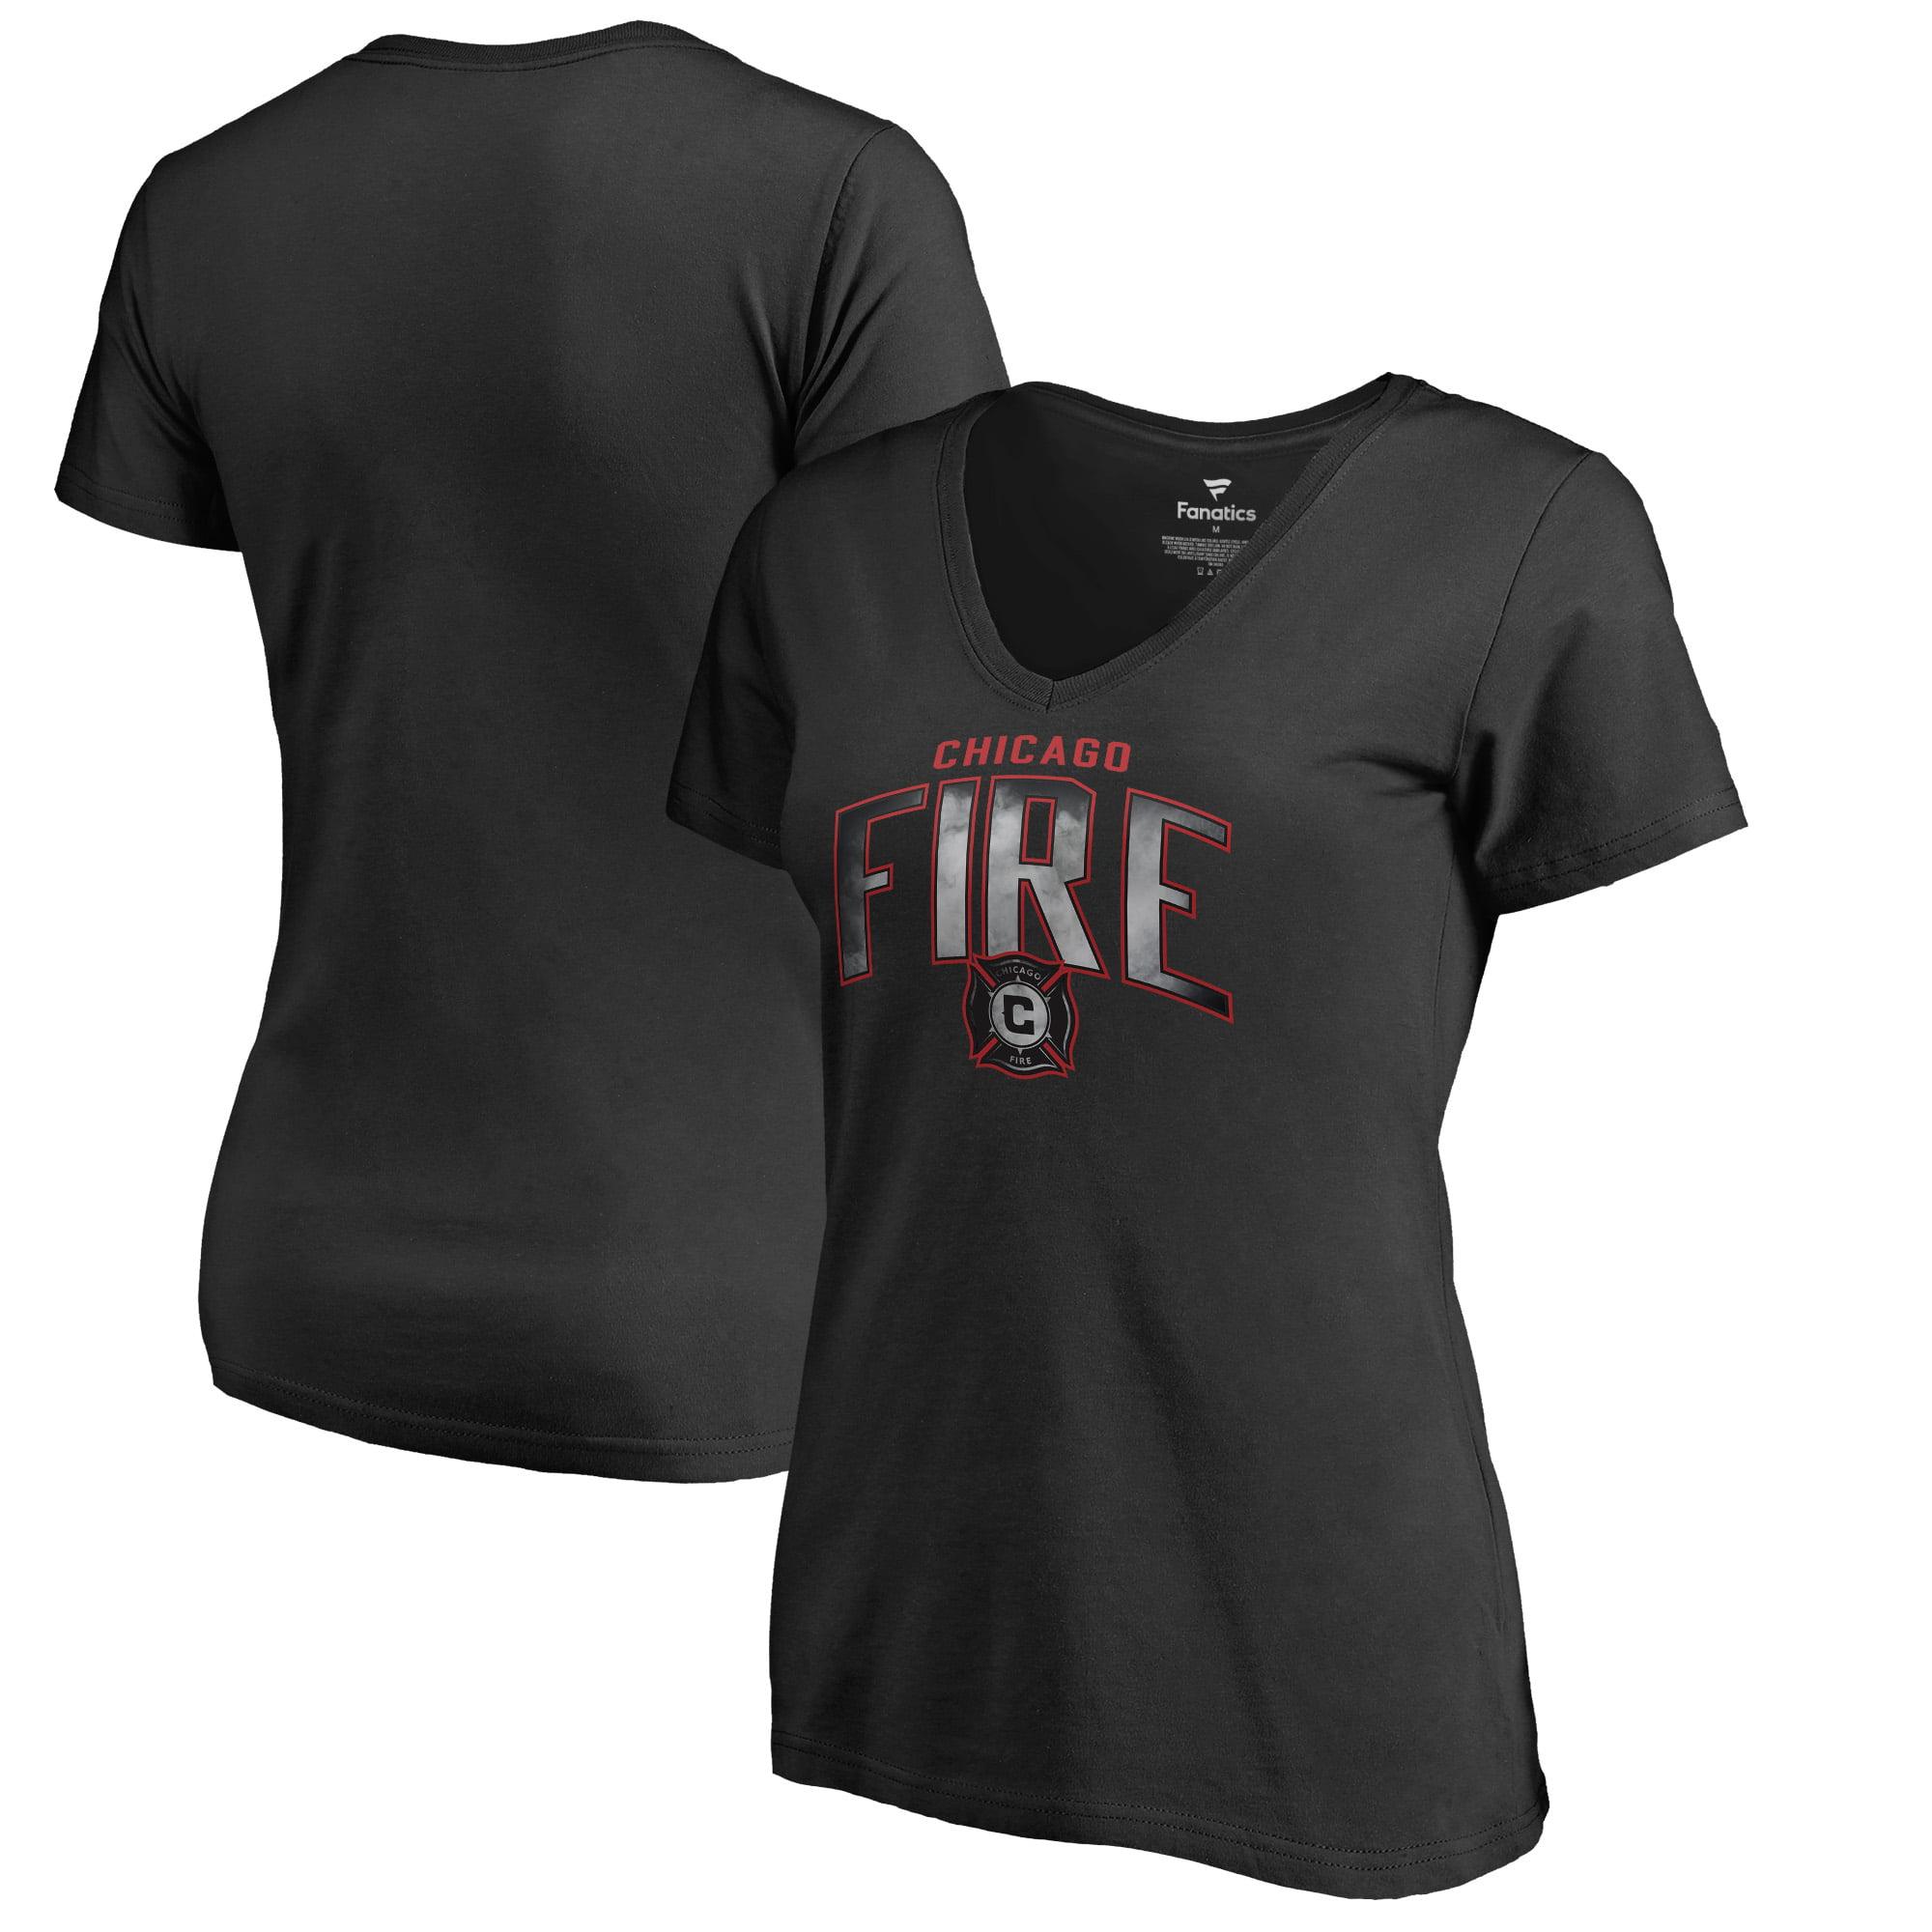 Chicago Fire Fanatics Branded Women's Arch Smoke V-Neck T-Shirt - Black